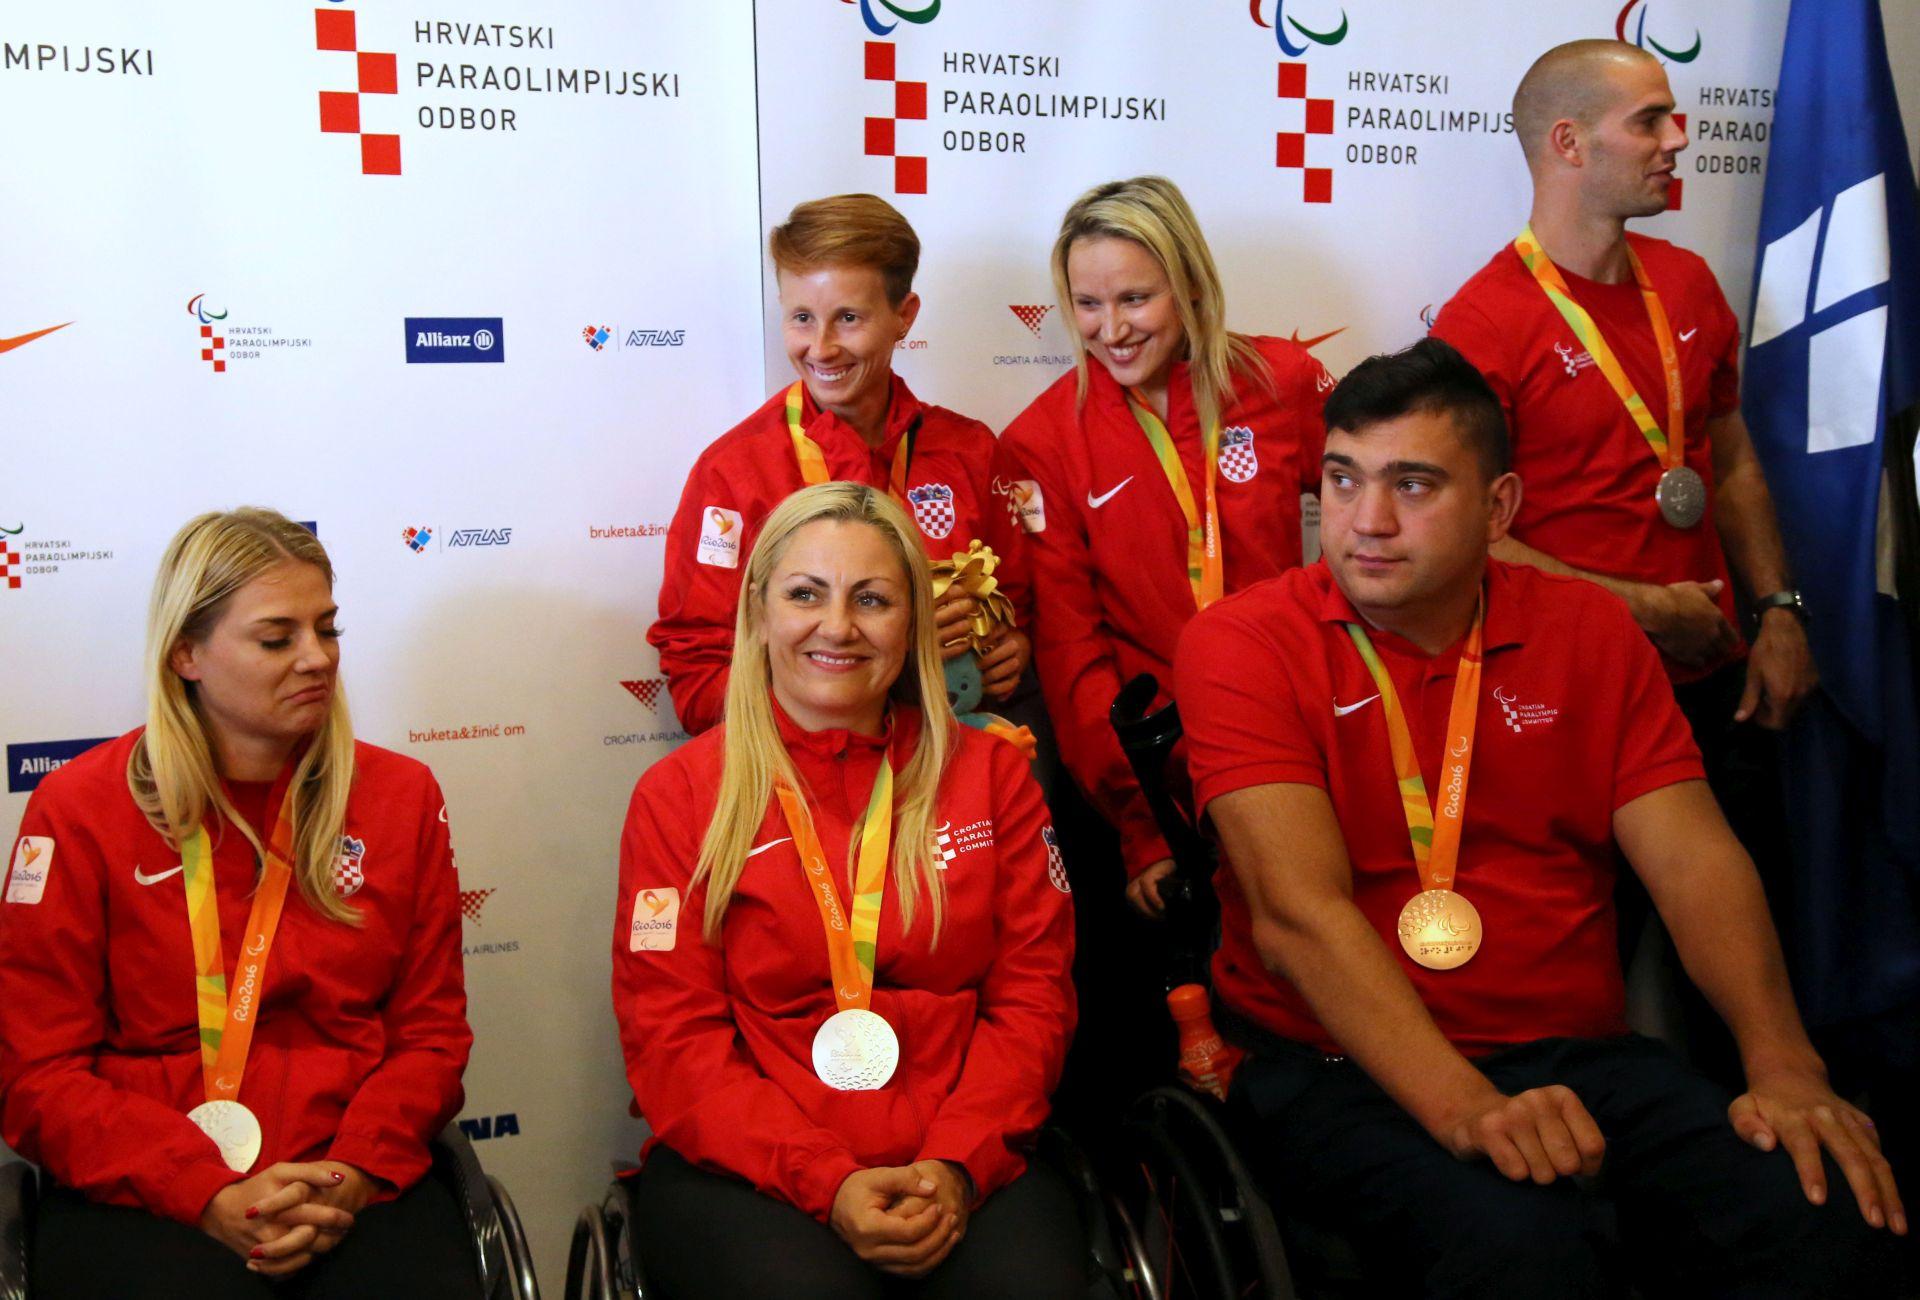 Hrvatska paraolimpijska reprezentacija se vratila iz Rio de Janeira